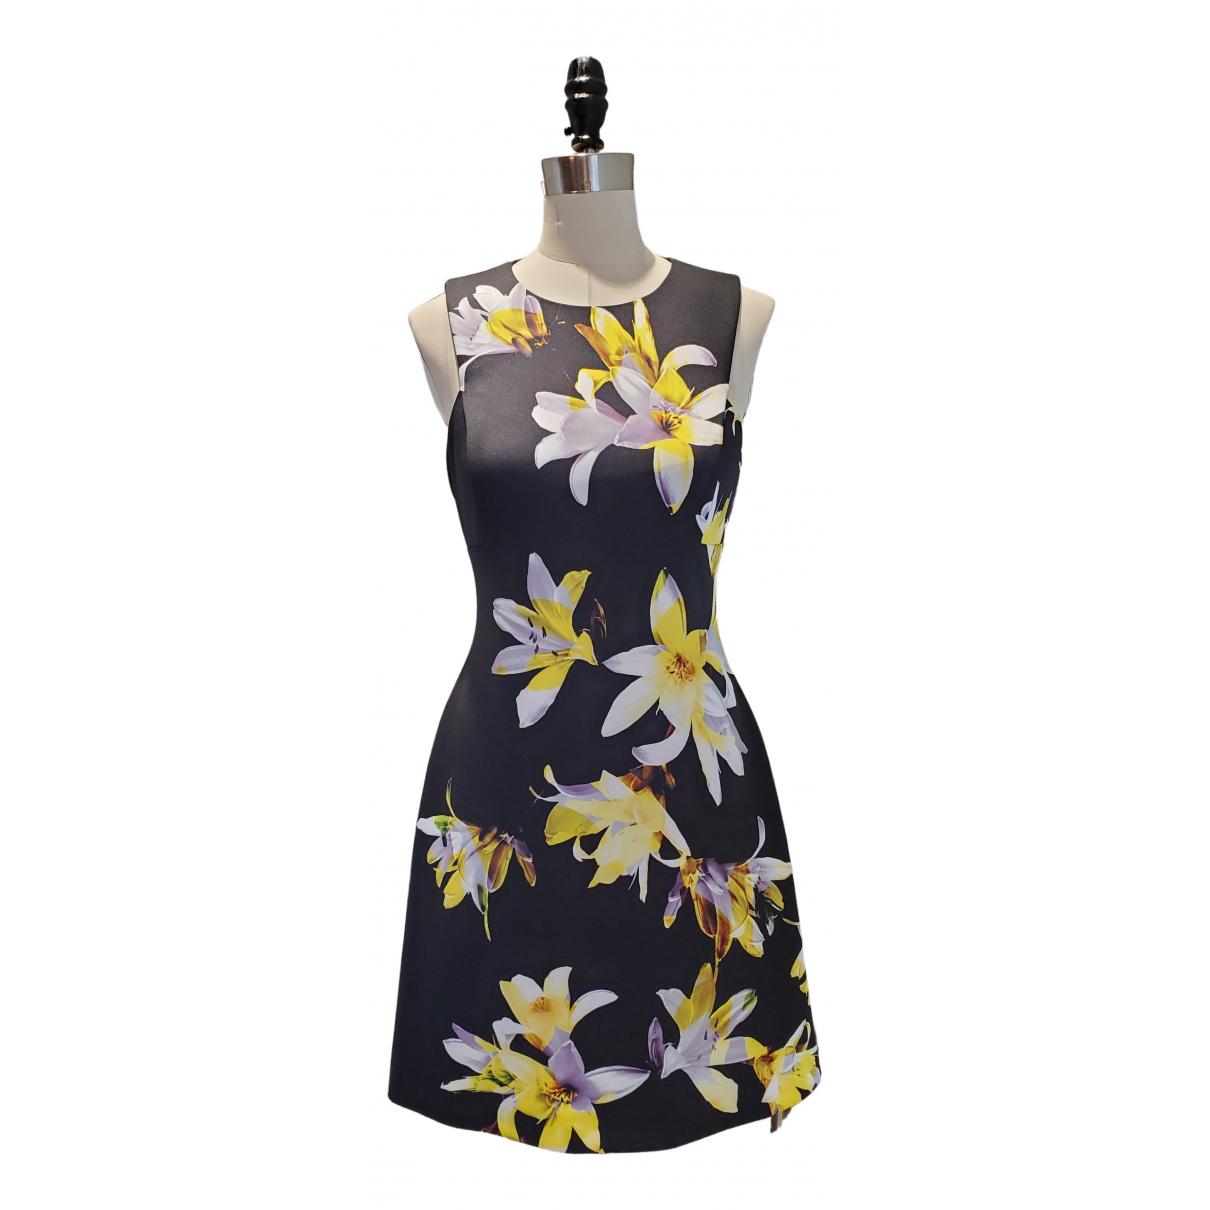 Karen Millen N Black dress for Women 10 UK